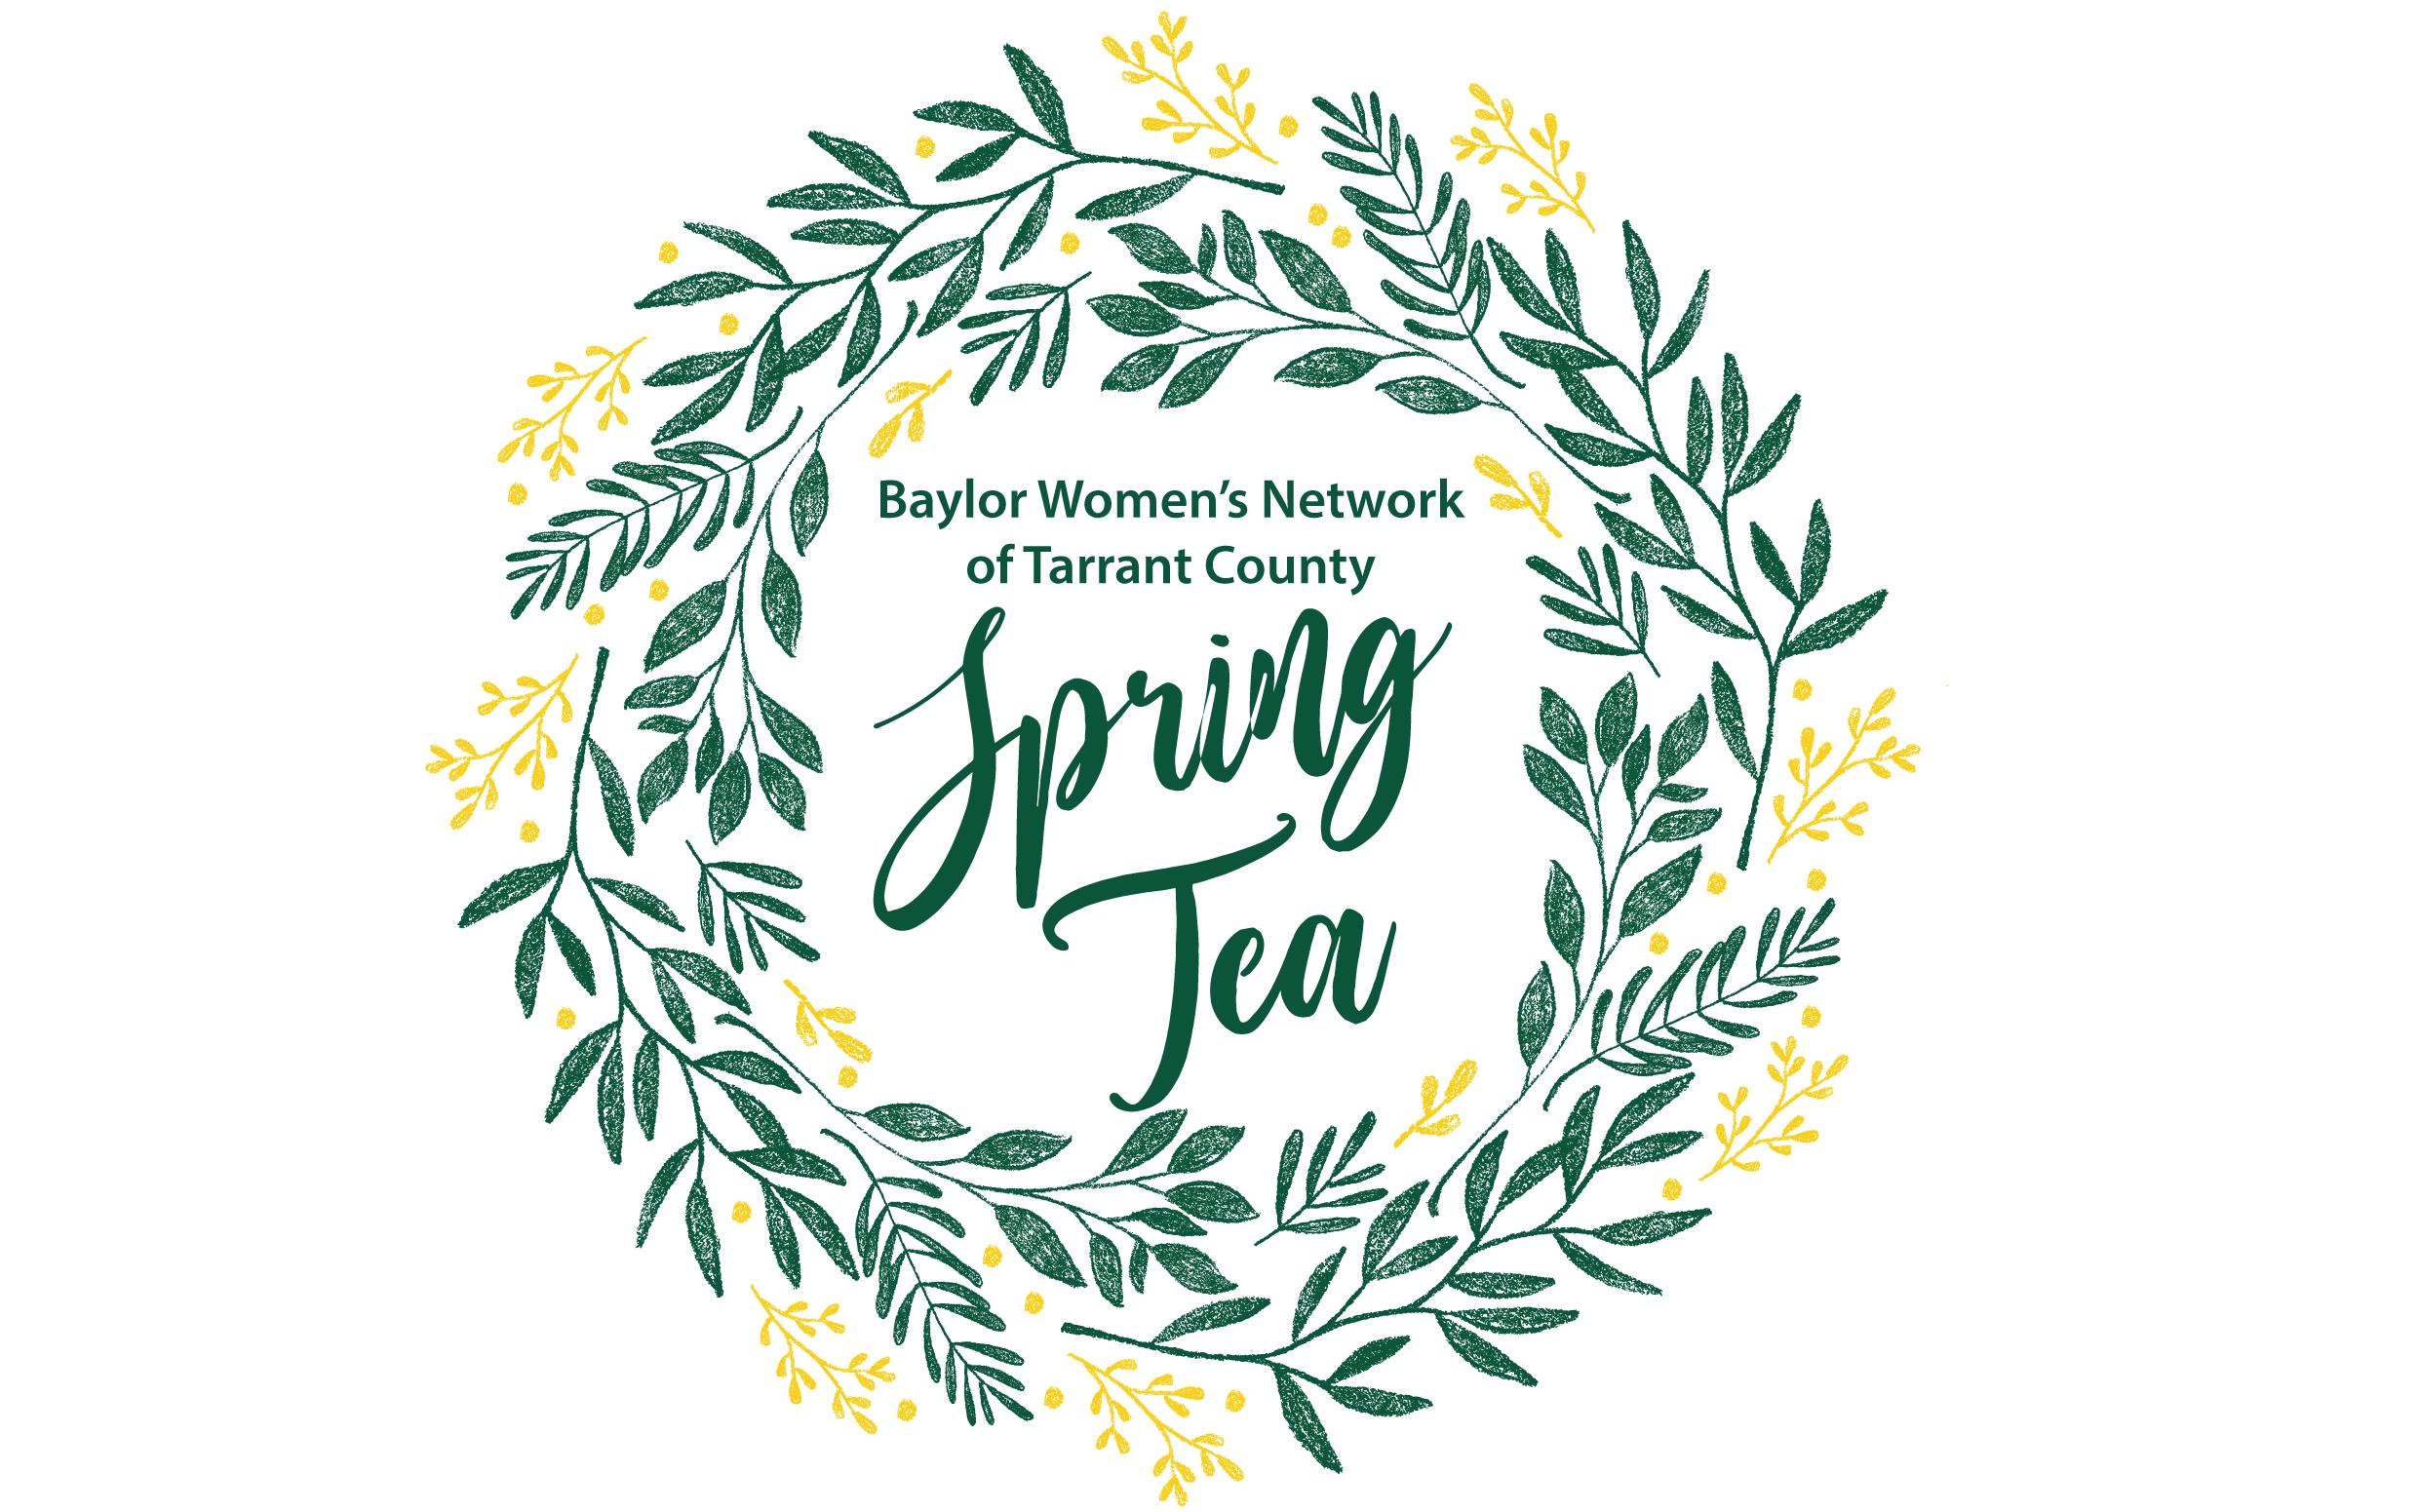 BWN Tarrant County Spring Tea